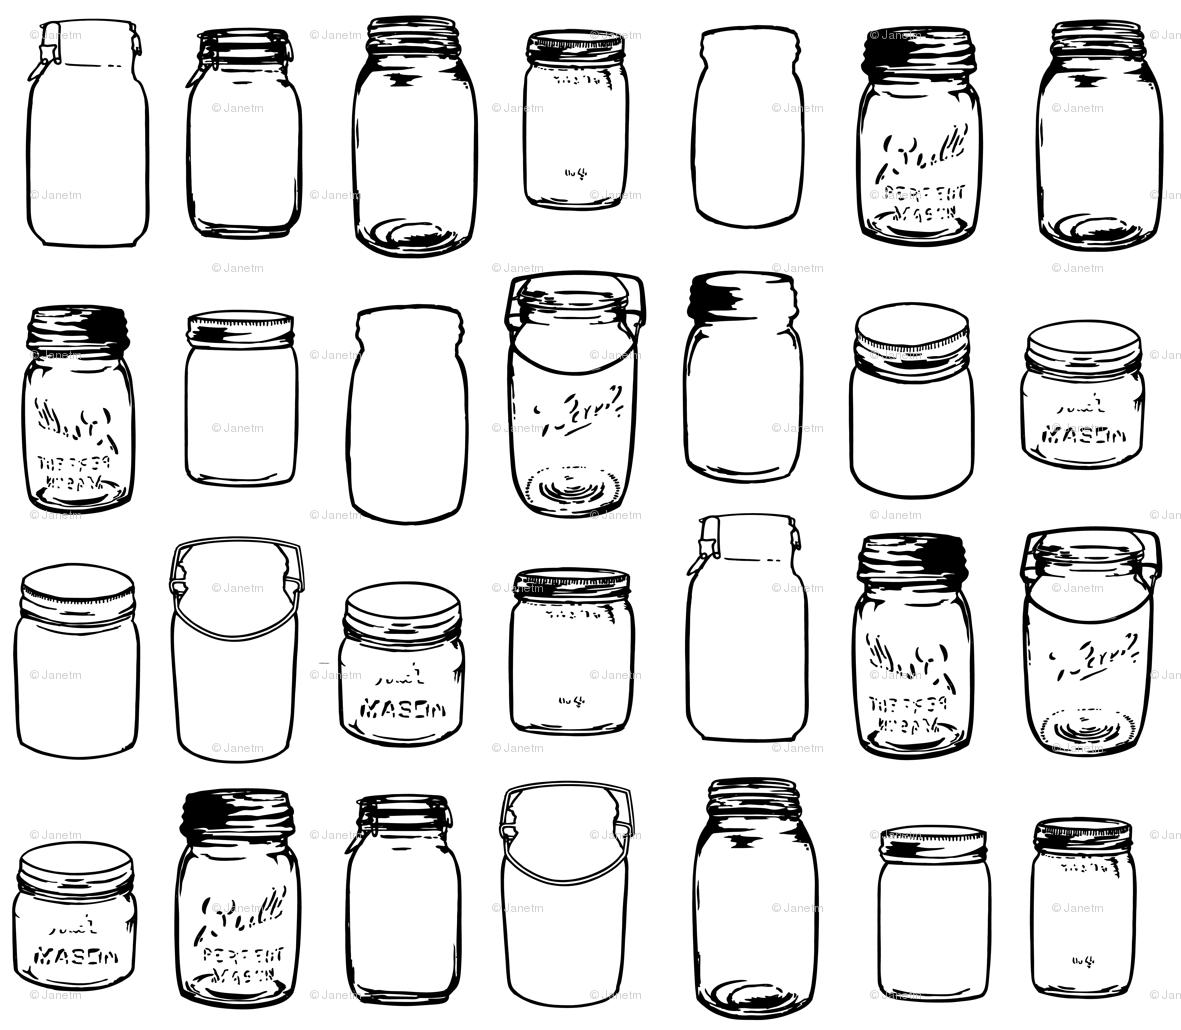 Jars Drawing Mason Jars Janetm